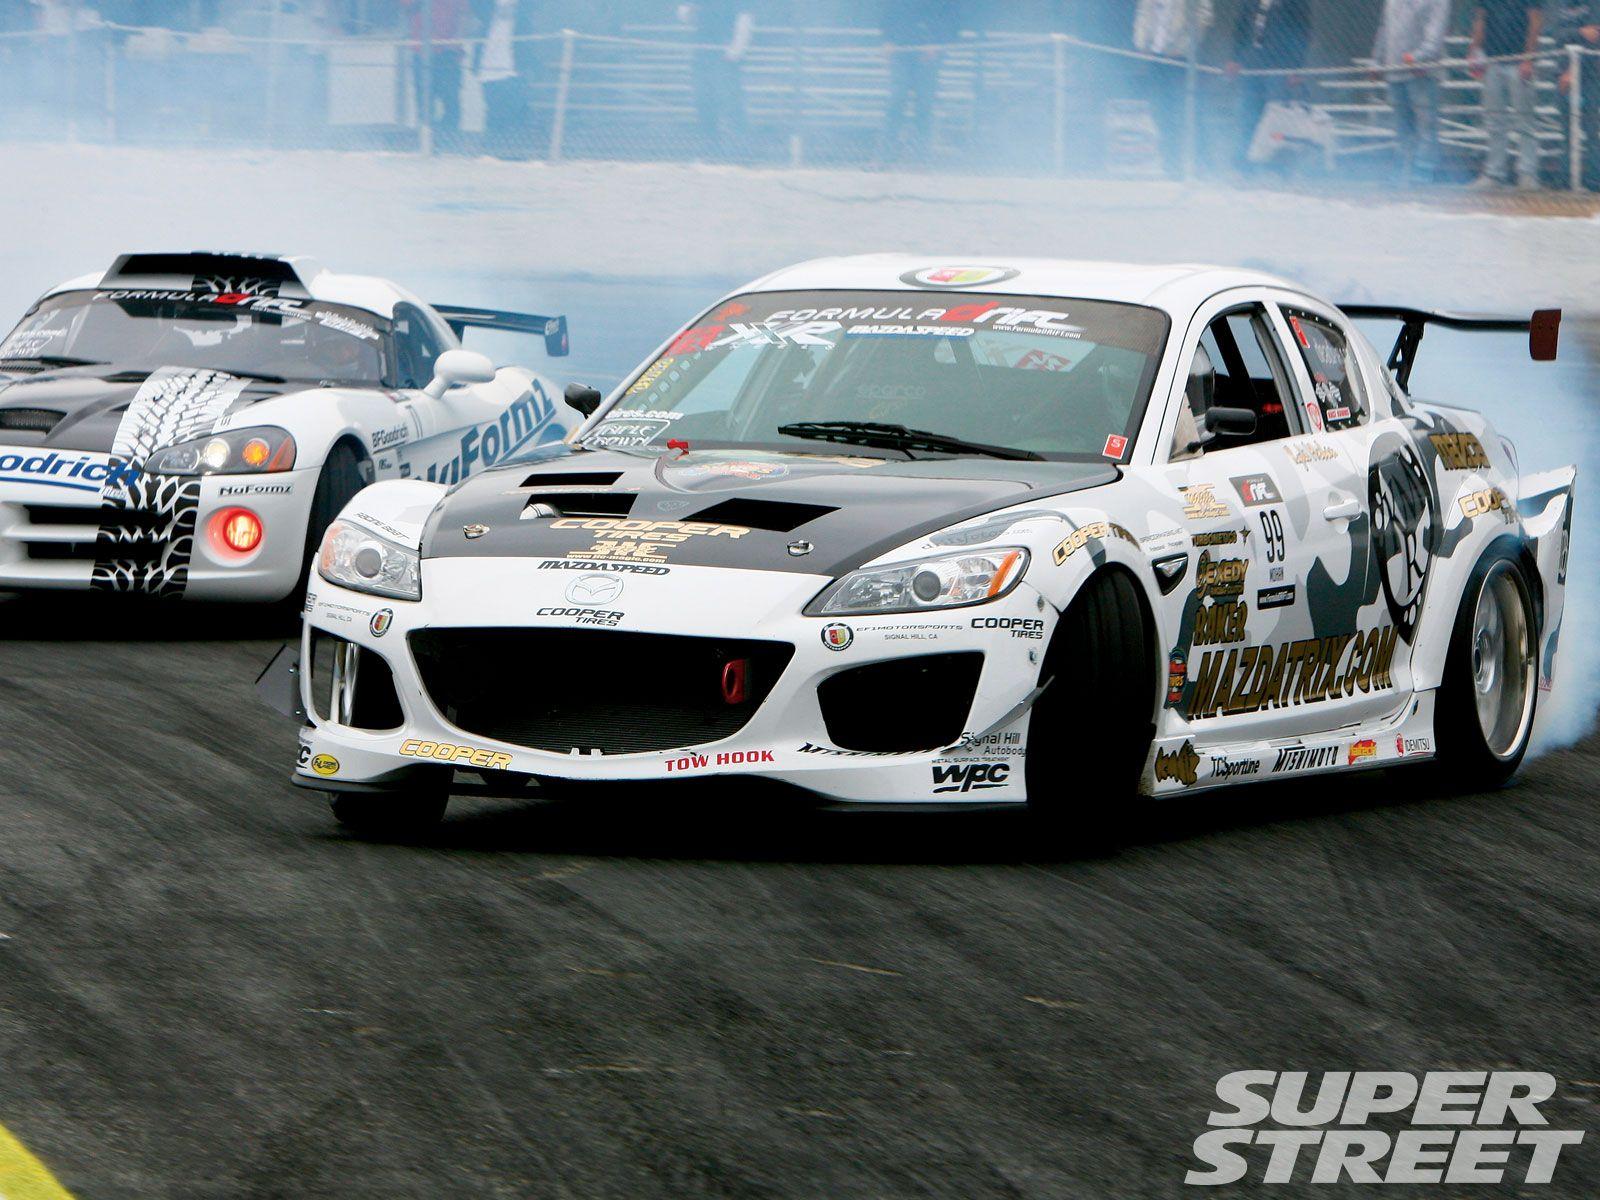 Mazda Drift Car Drifting Cars Mazda And Cars